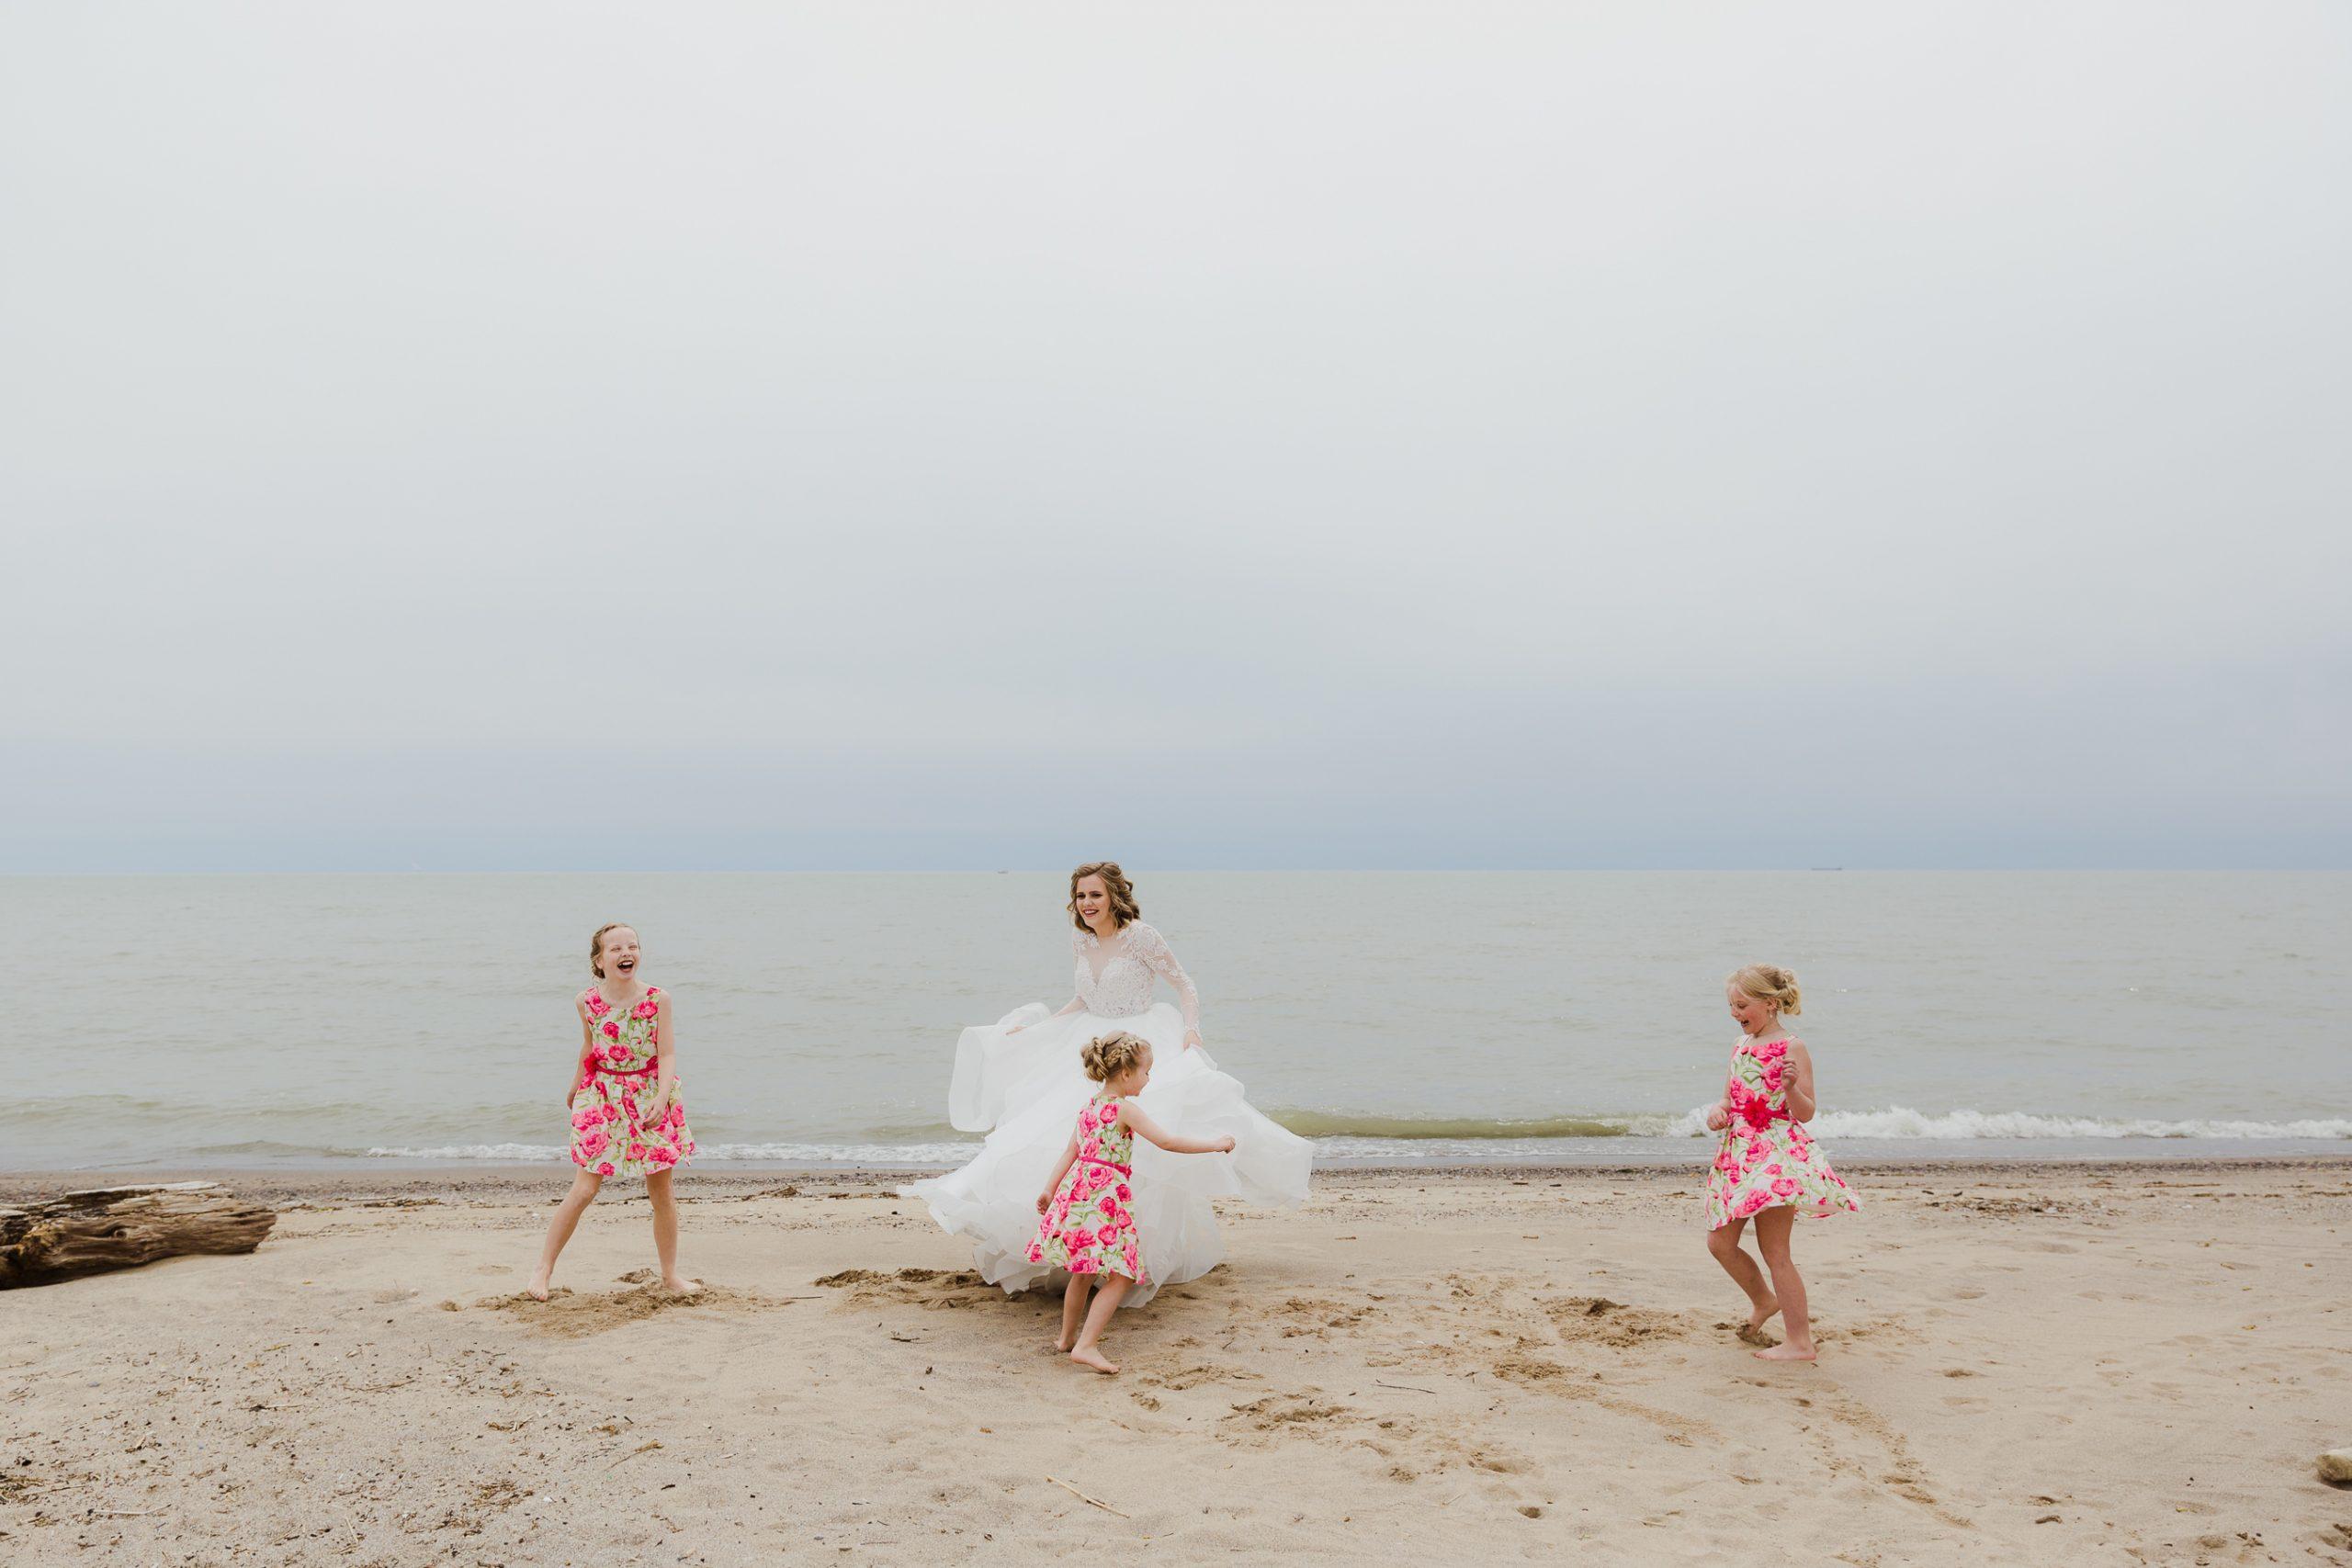 Wedding photo flower girls with bride cute idea spinning on the beach